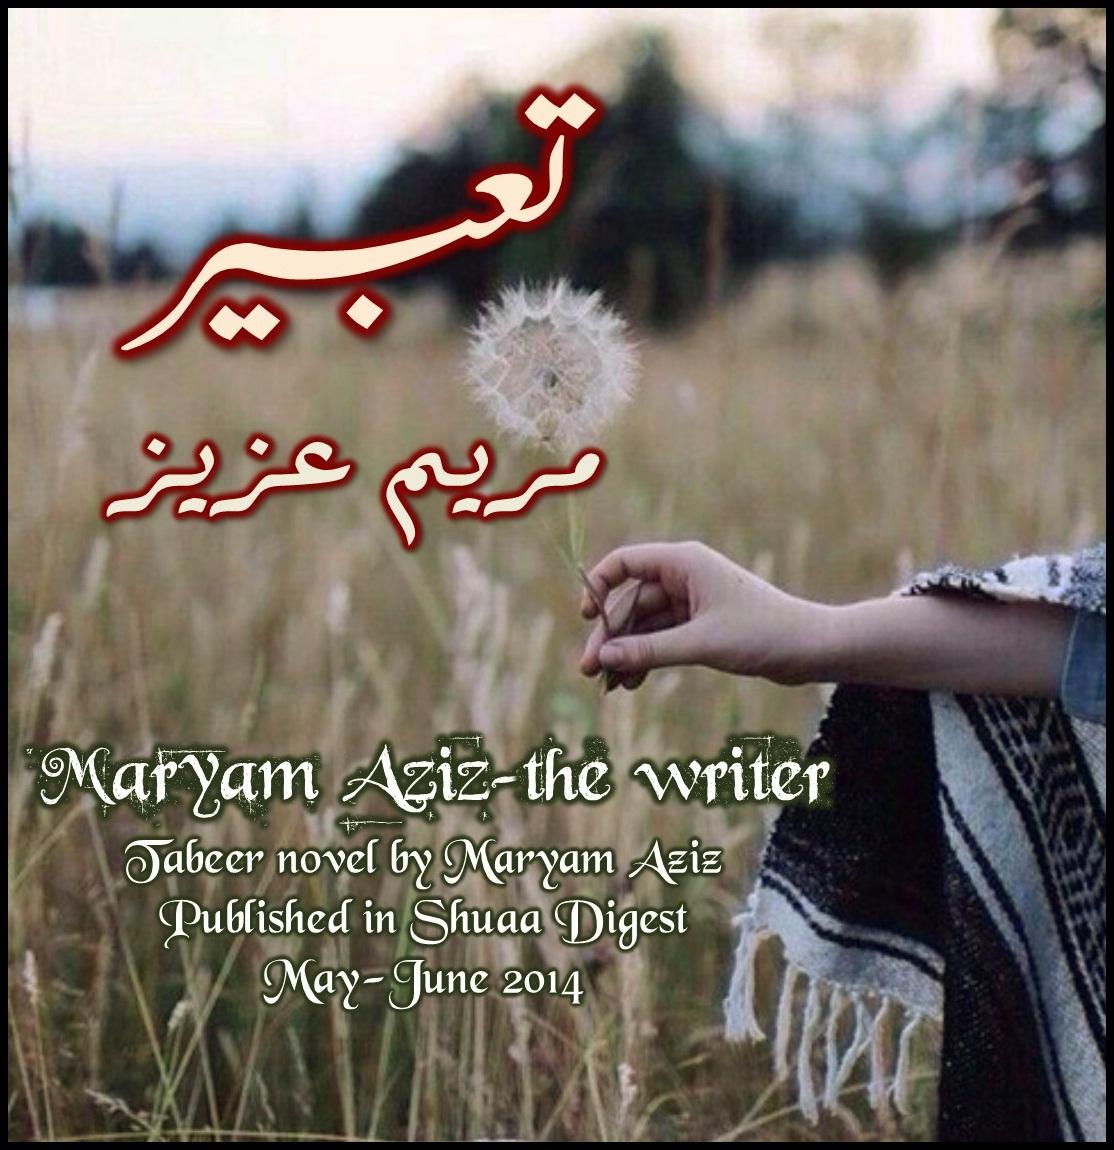 Tabeer Novel By Maryam Aziz Pdf